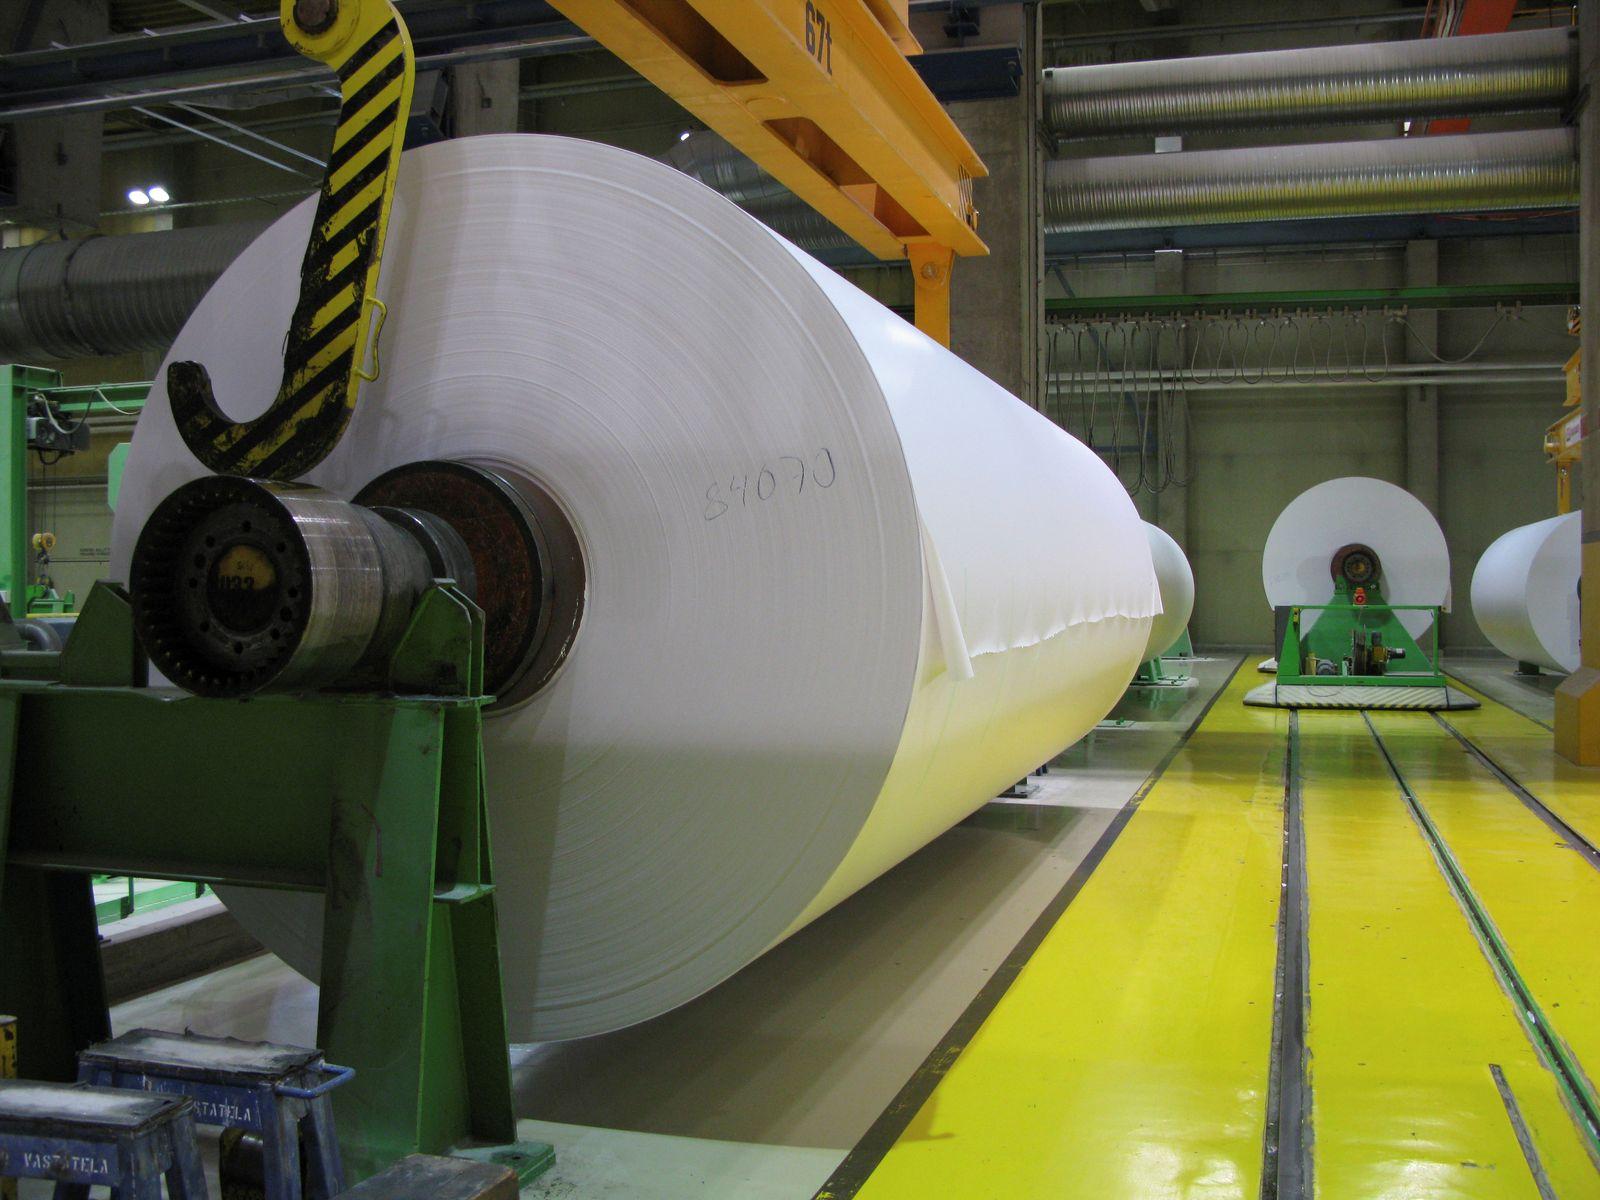 Magazine paper rolls are seen at UPM-Kymmene's paper mill in Kaukas, Lappeenranta